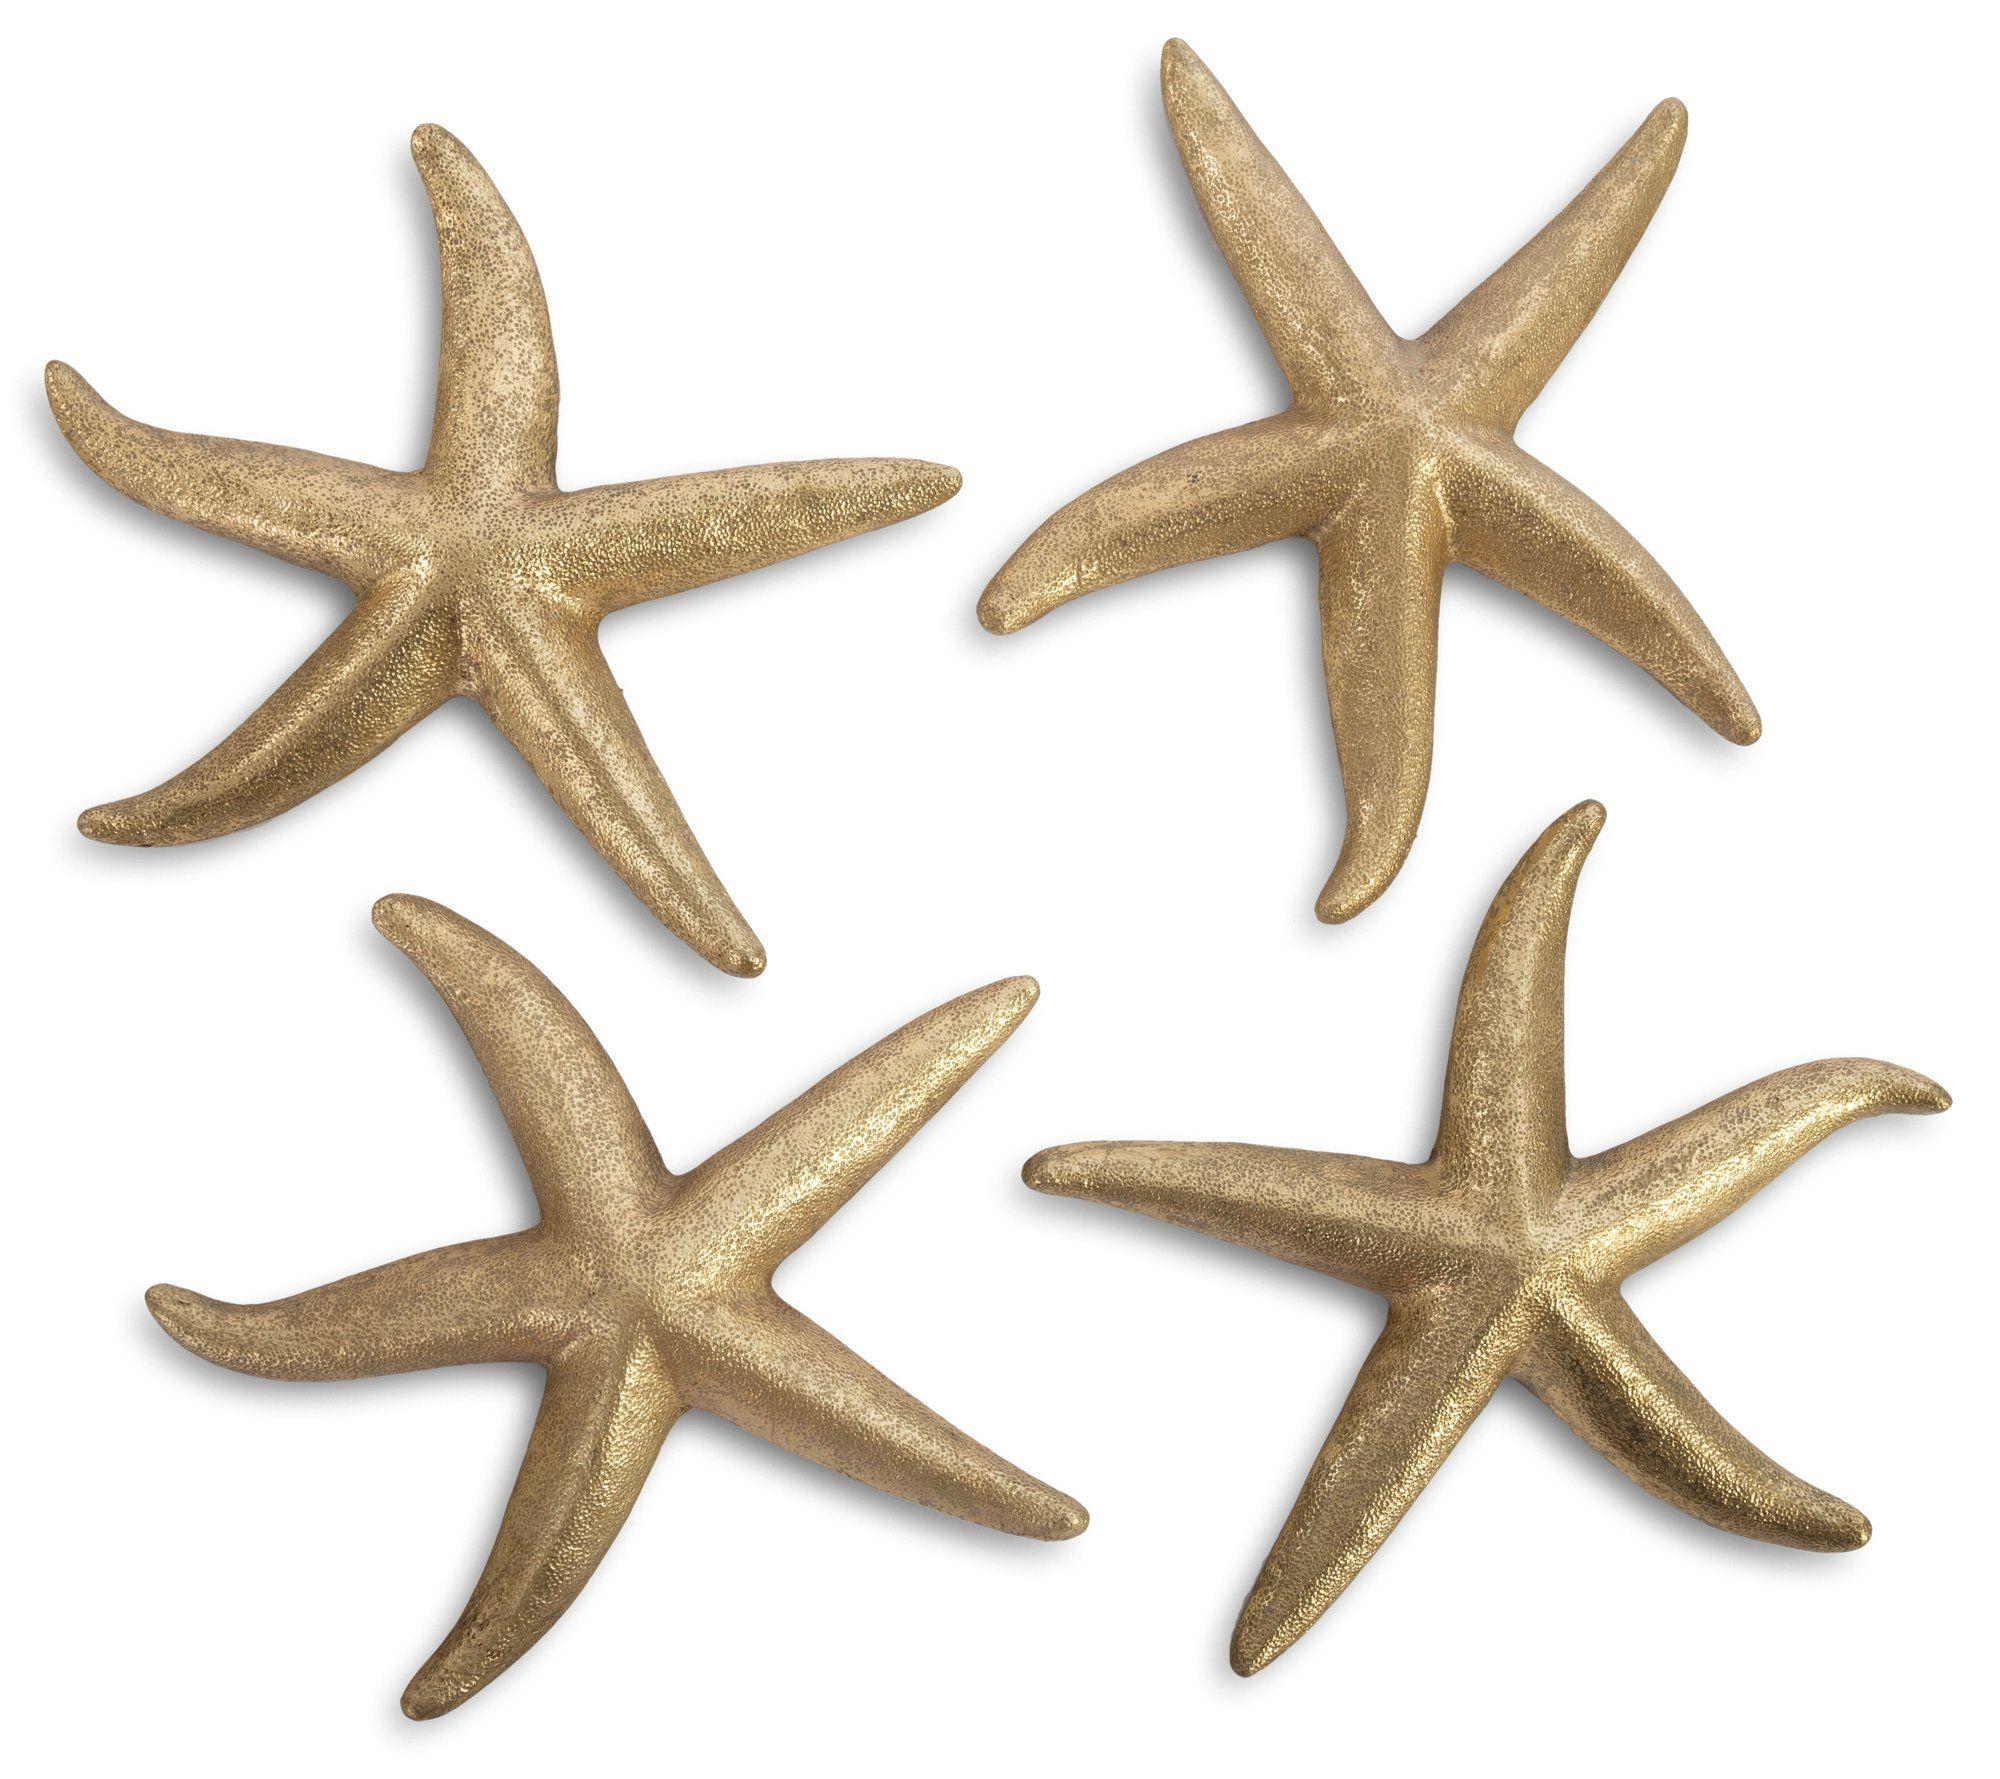 Fashionable Yelton 3 Piece Starfish Wall Decor Sets Inside 4 Piece Starfish Leaf Wall Decor Set (View 8 of 20)